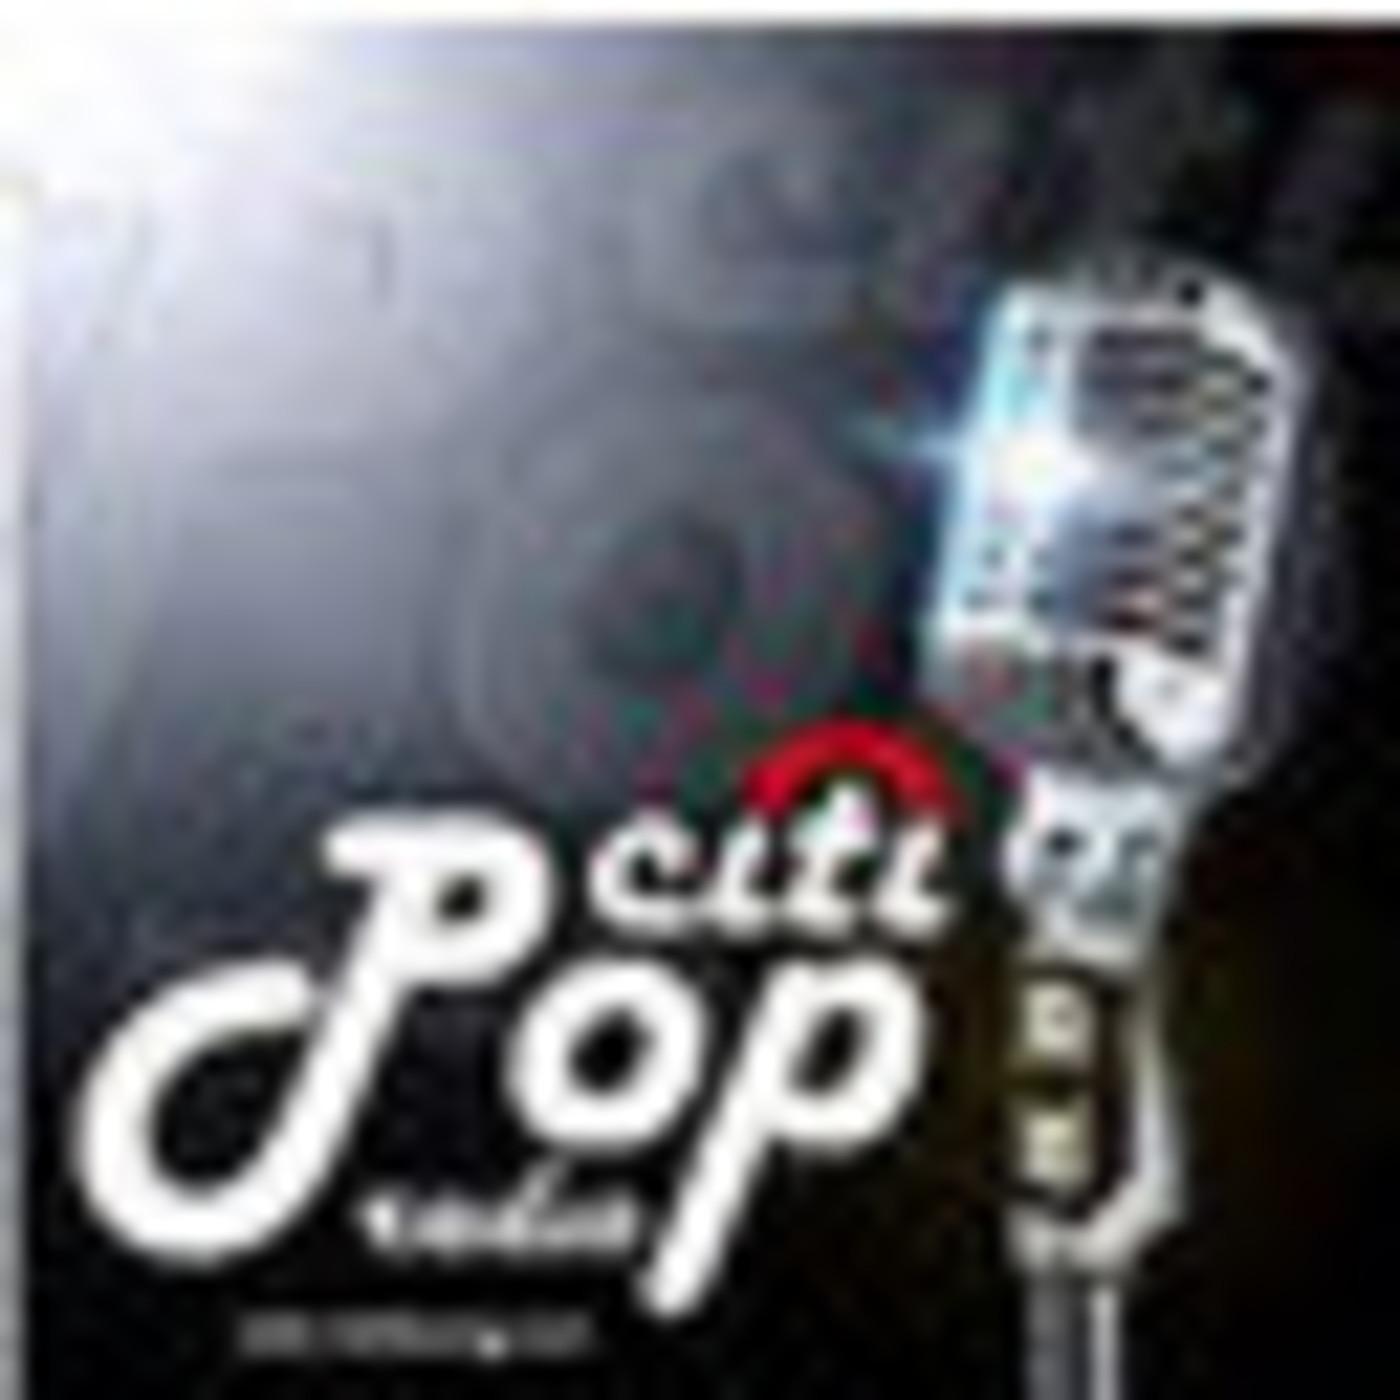 radio pop rock internacional online dating